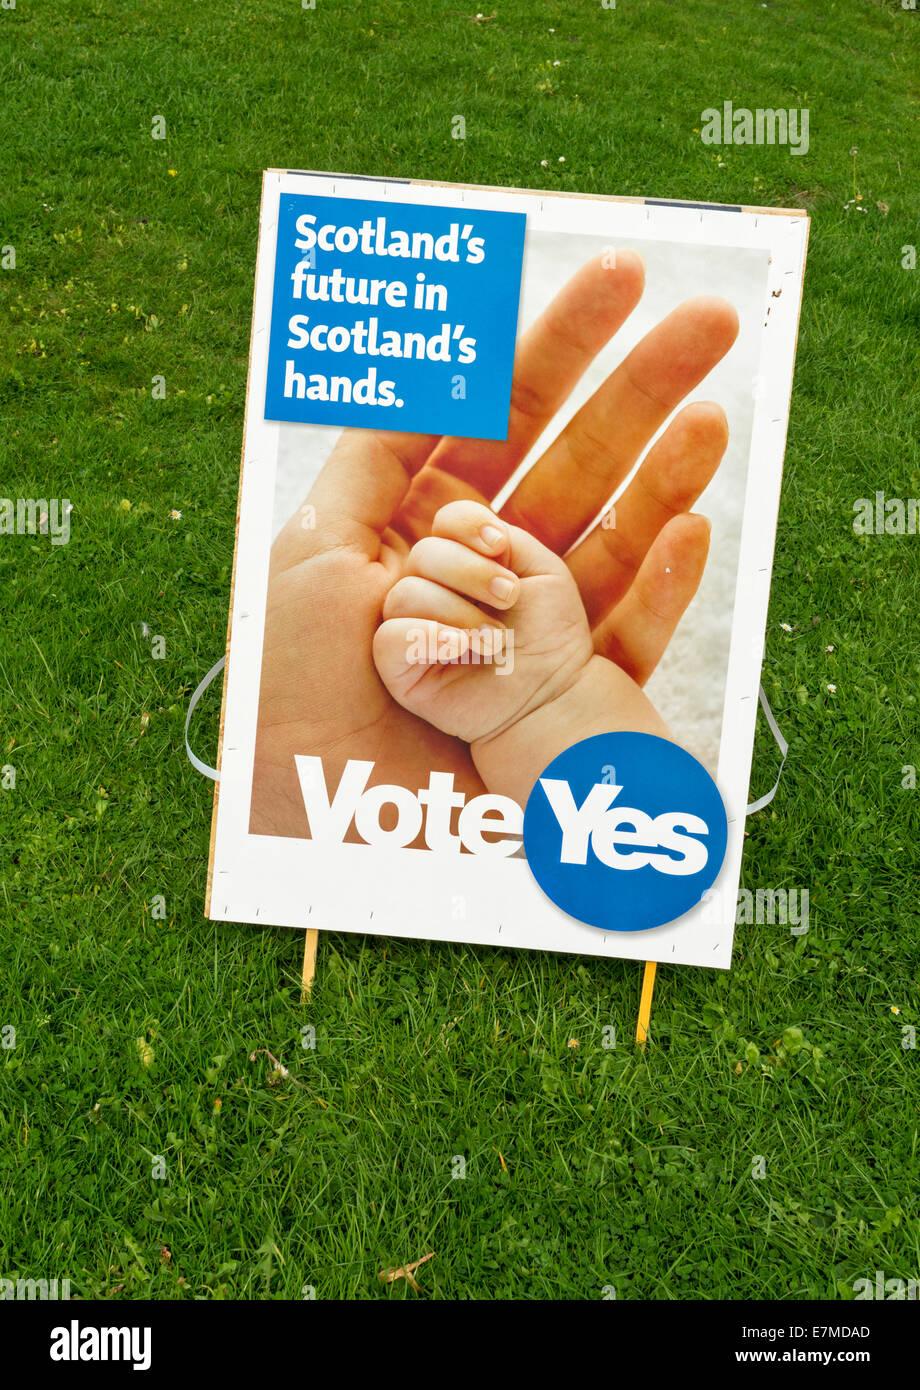 SCOTTISH INDEPENDENCE REFERENDUM 2014 VOTE YES SIGN SCOTLANDS FUTURE IN SCOTLANDS HANDS Stock Photo